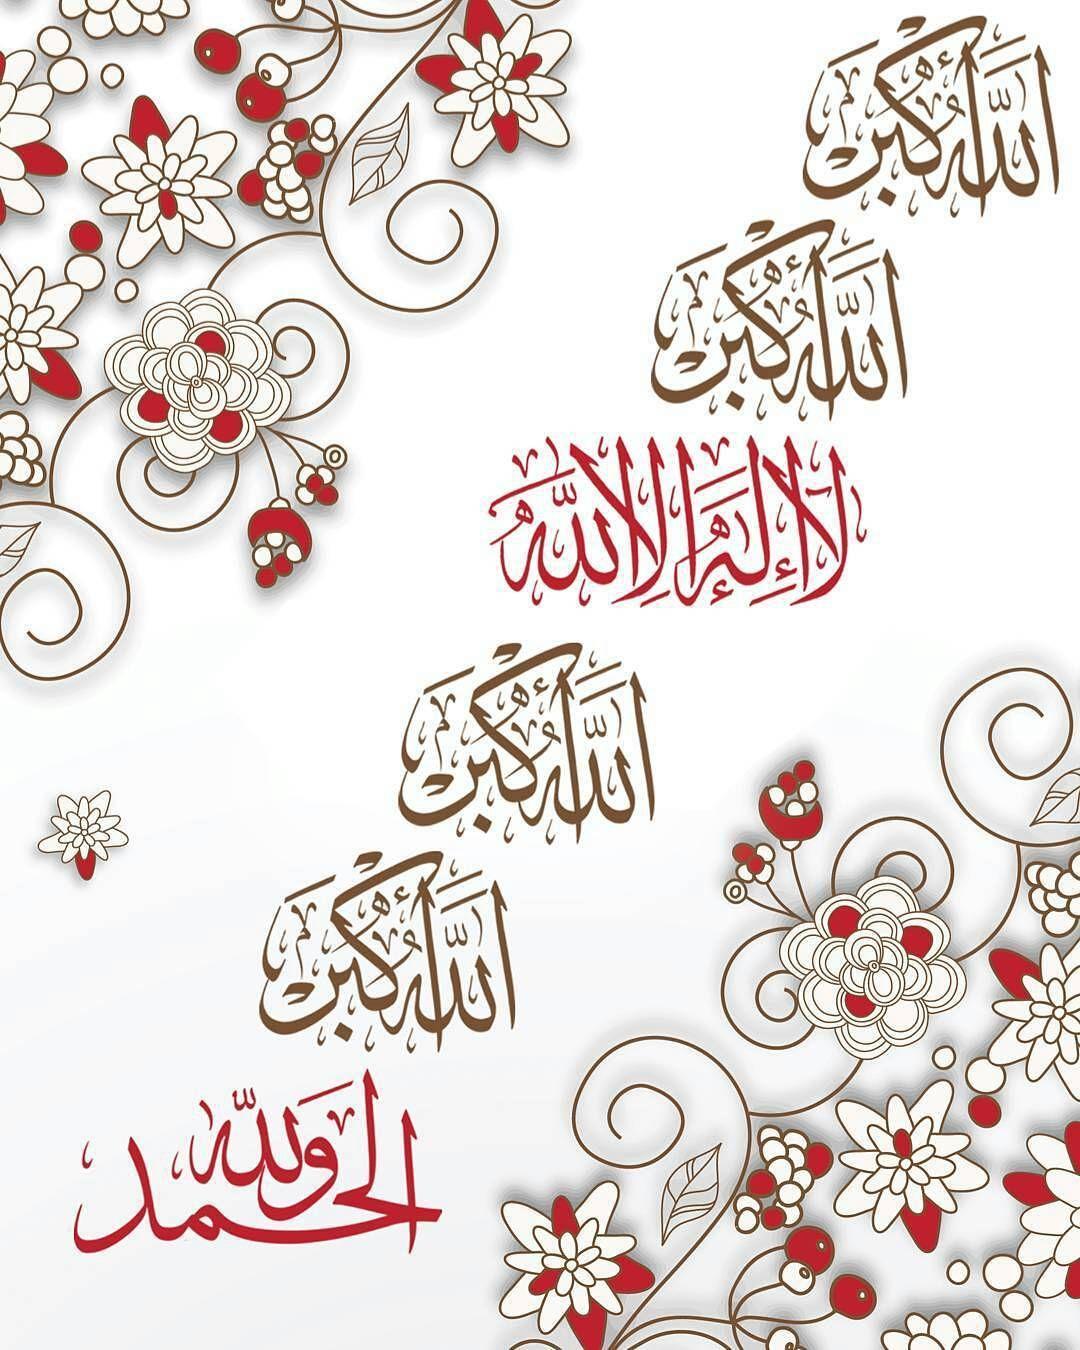 Pin By Malek Nasser On Islamic Programming Apps Cute Drawings Greetings